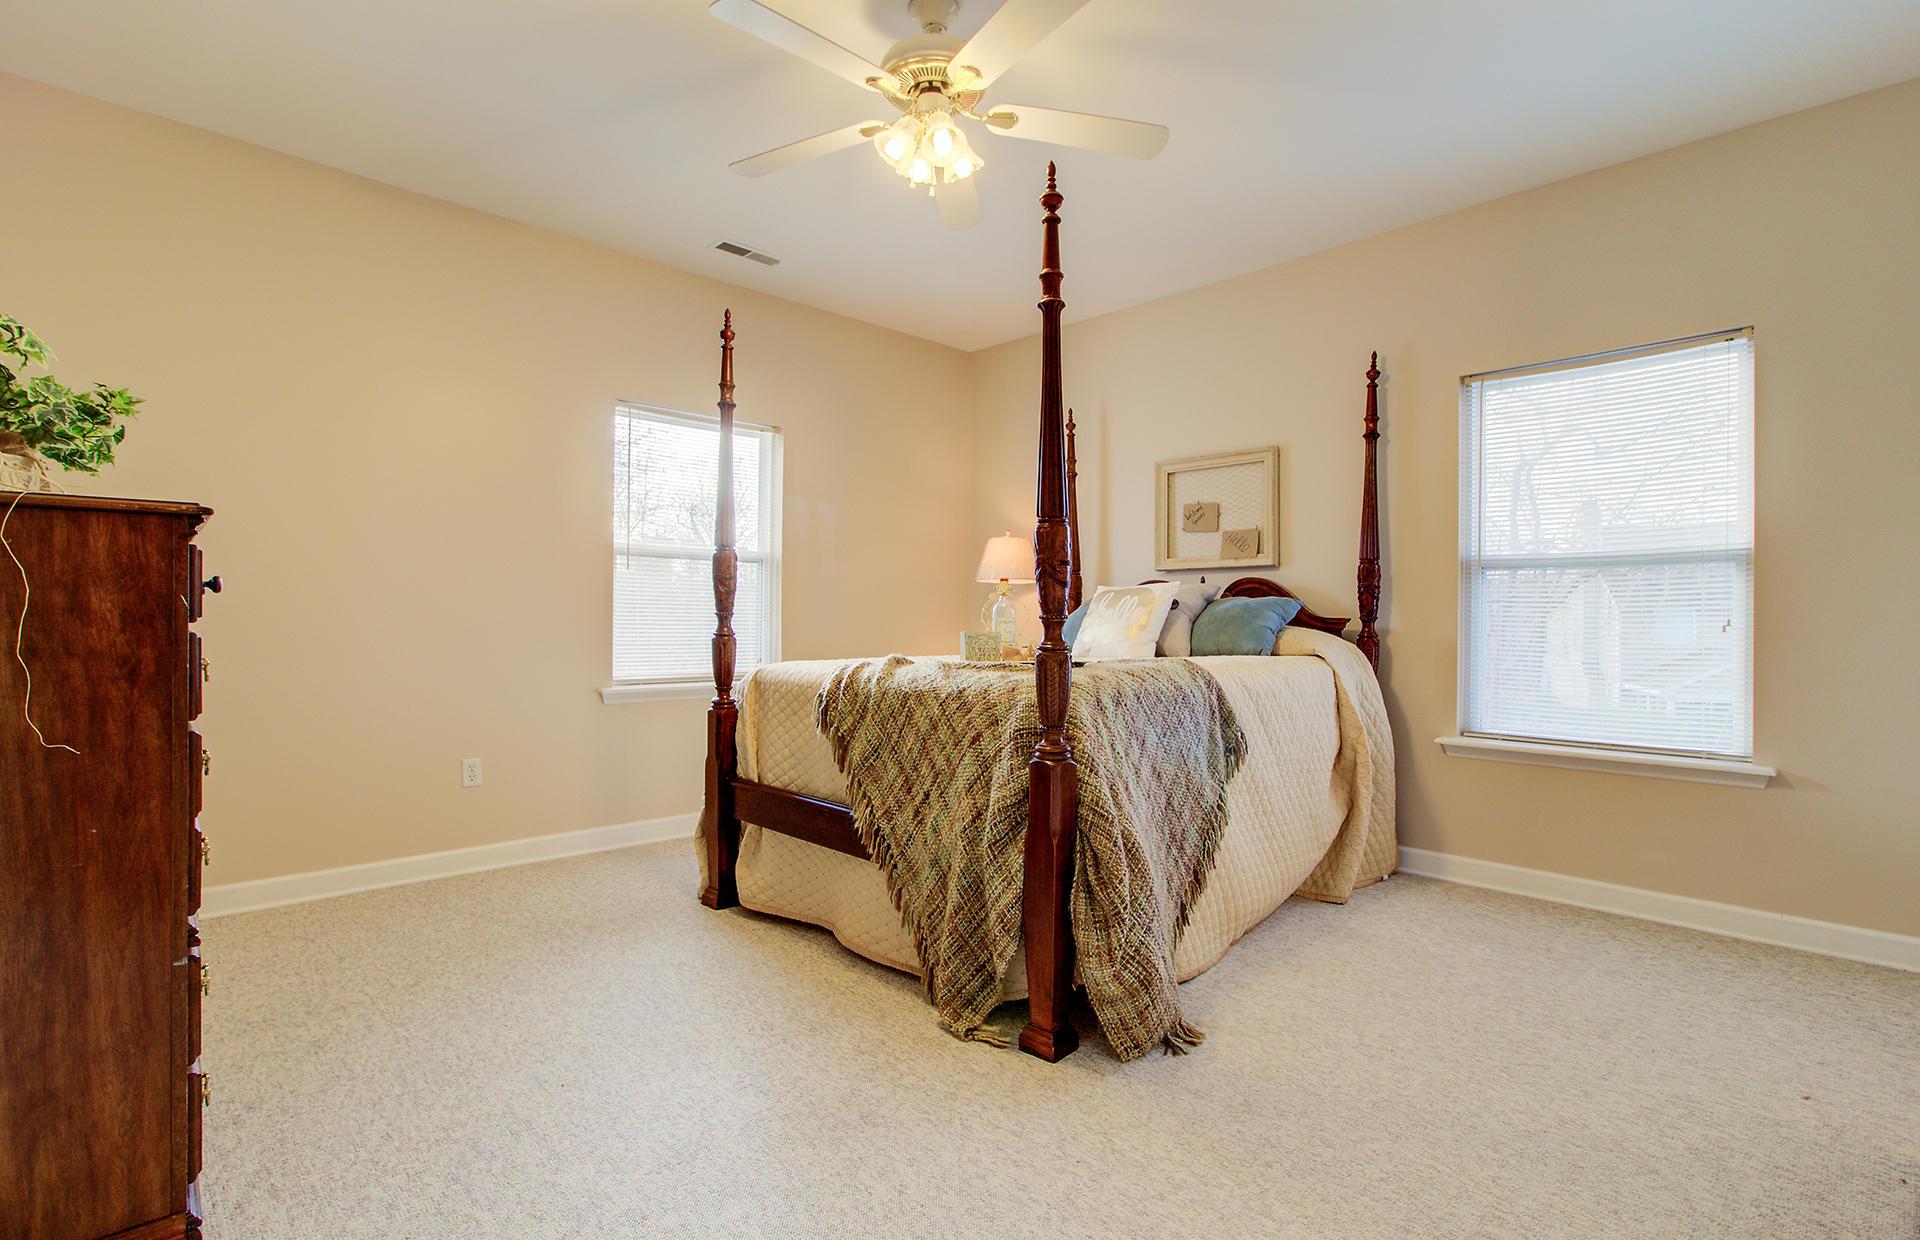 Bakers Landing Homes For Sale - 105 River Oak, North Charleston, SC - 28